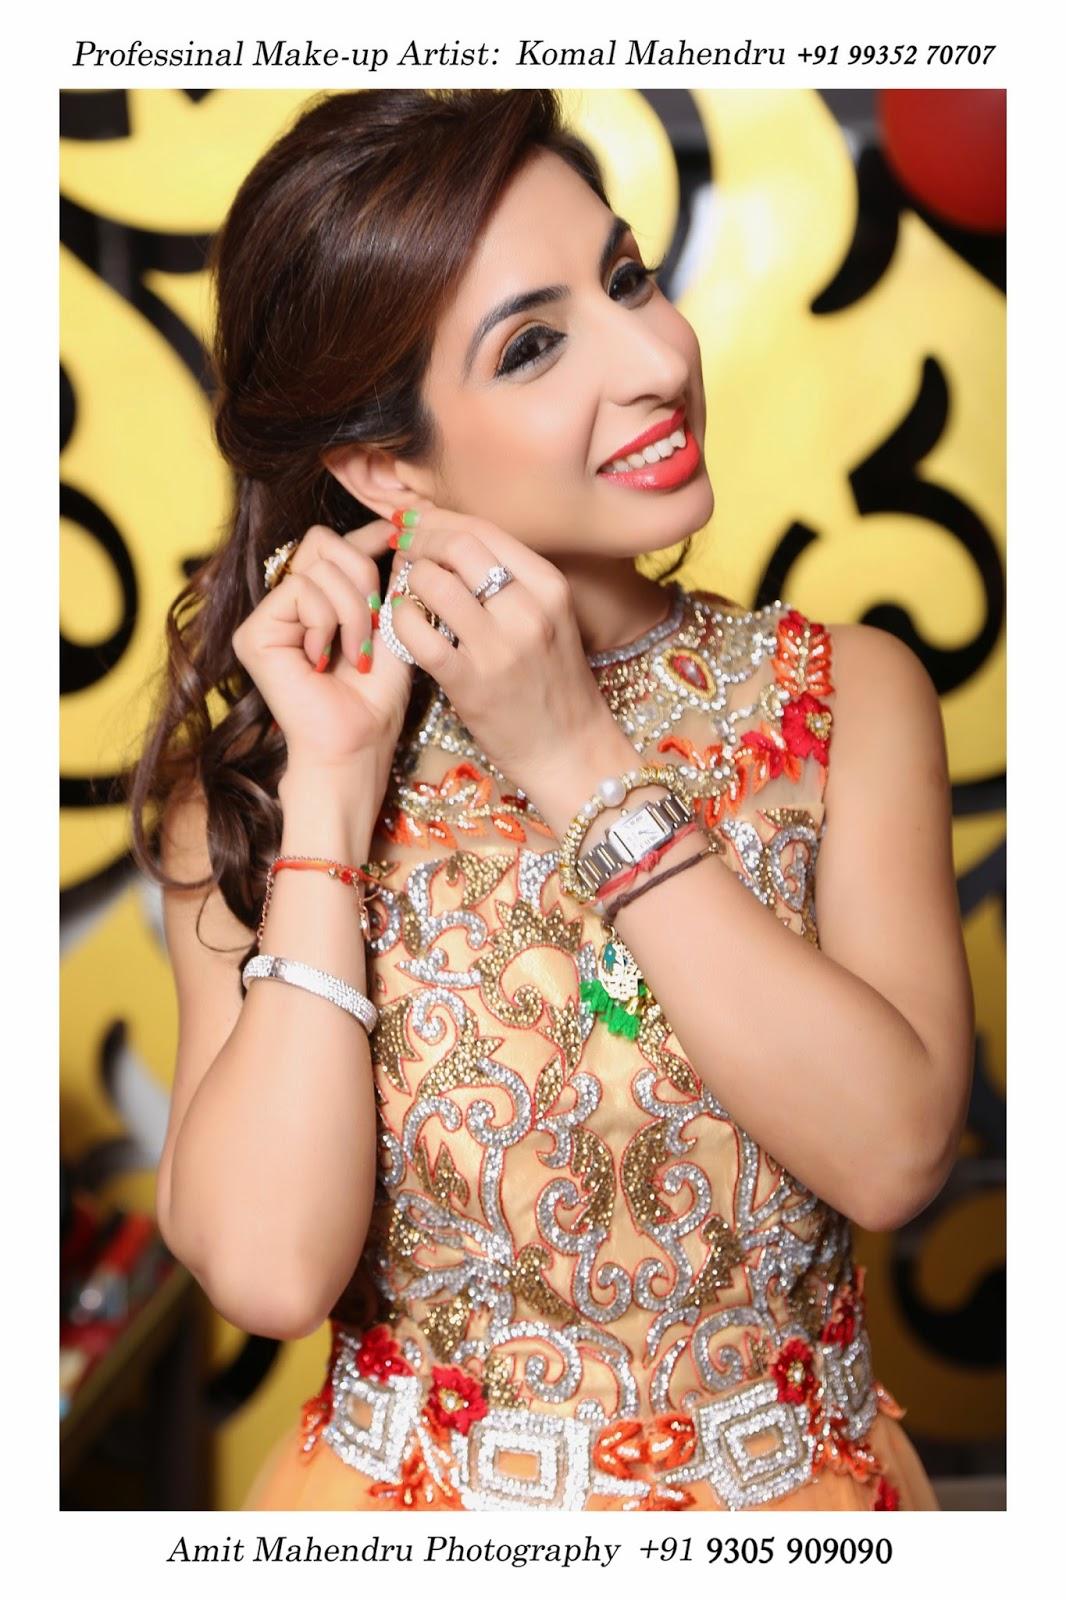 Komal mahendru s professional makeup lucknow india bridal makeup - Professional Makeup Artist In Lucknow By Komal Mahendru